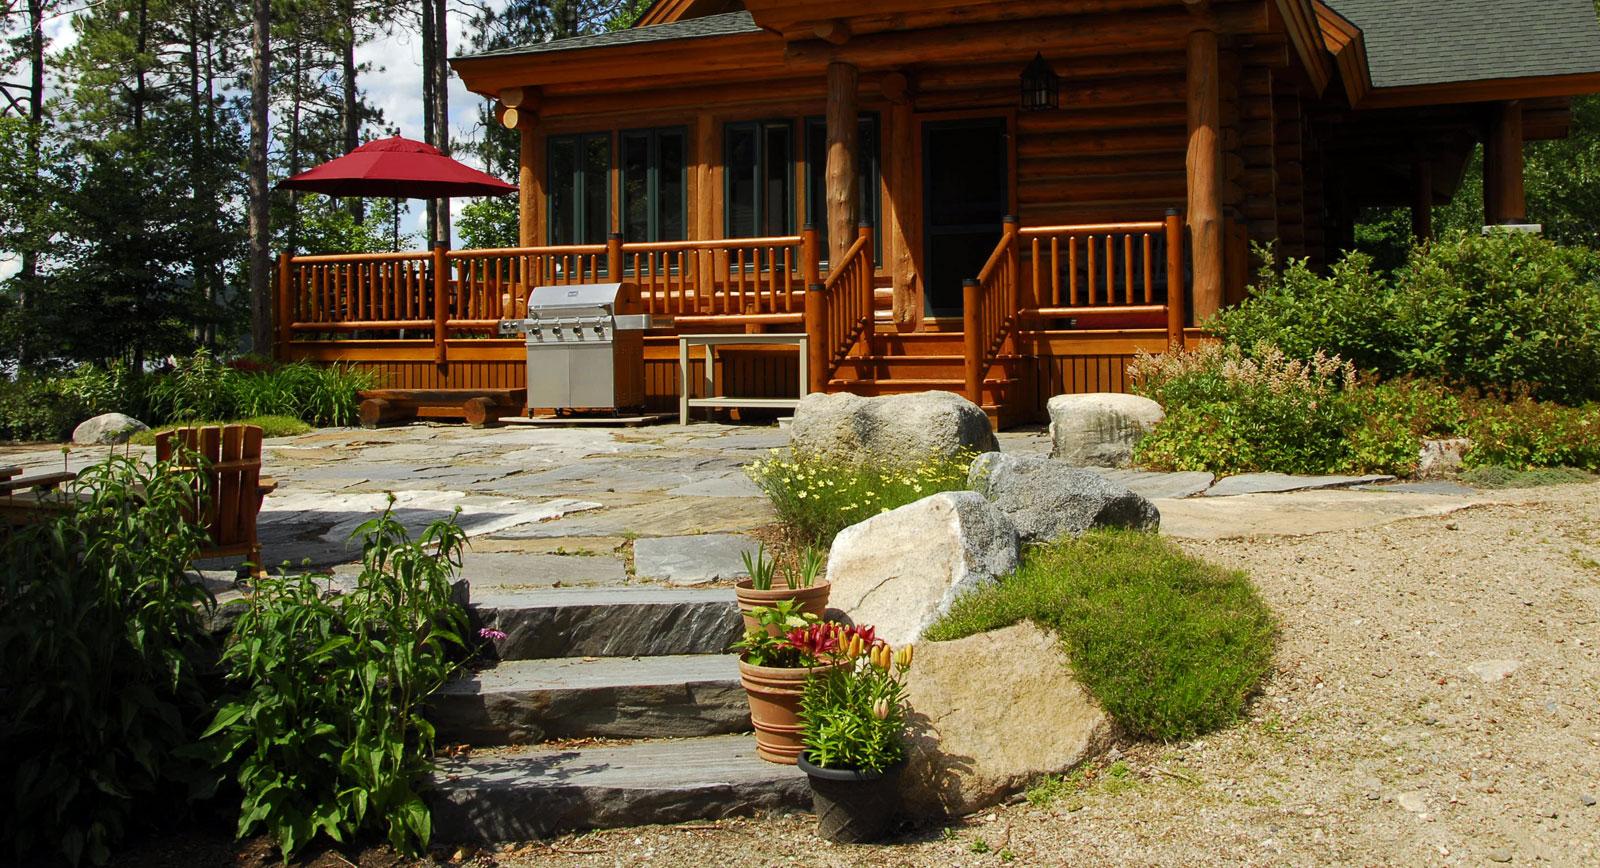 Denmark lake house gnome landscape design masonry for Log home landscape design